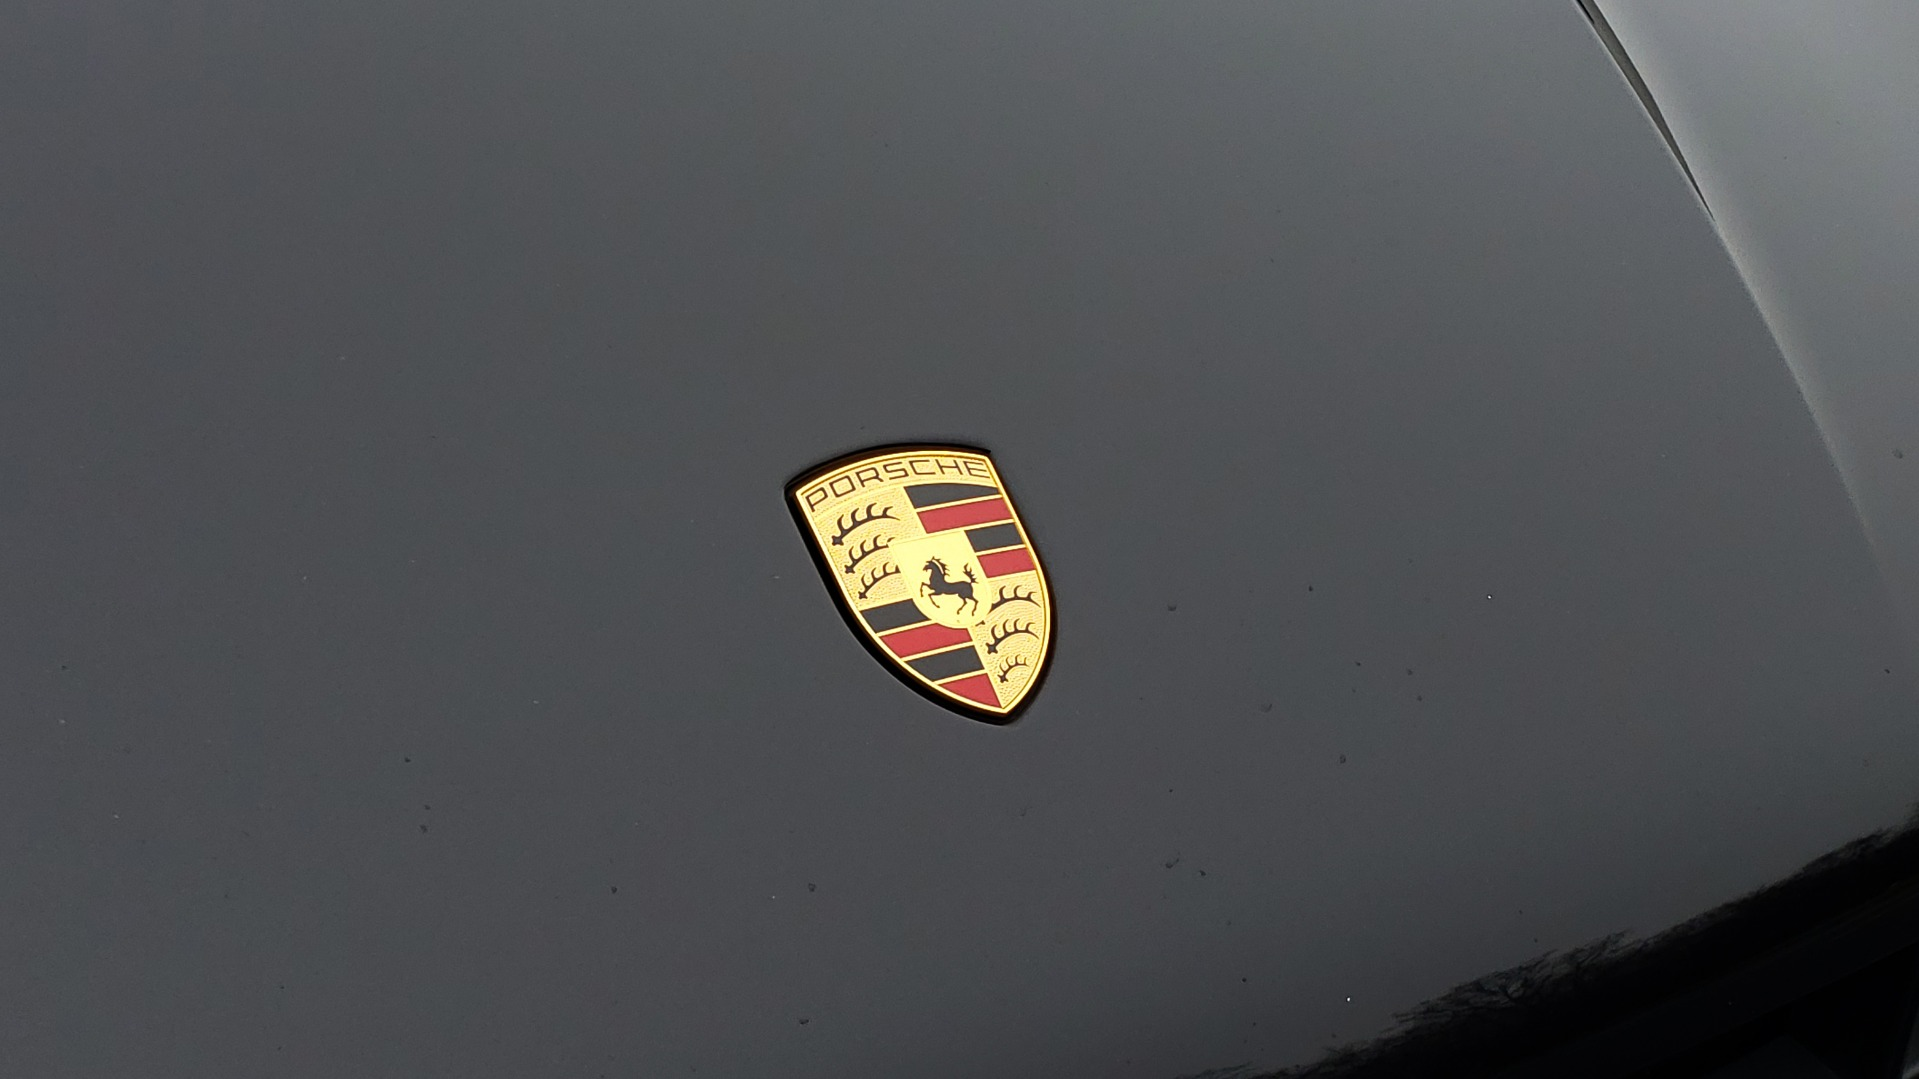 Used 2016 Porsche MACAN TURBO / PREM / NAV / PARK ASST / BOSE / PDK / CHRONO PKG for sale Sold at Formula Imports in Charlotte NC 28227 9